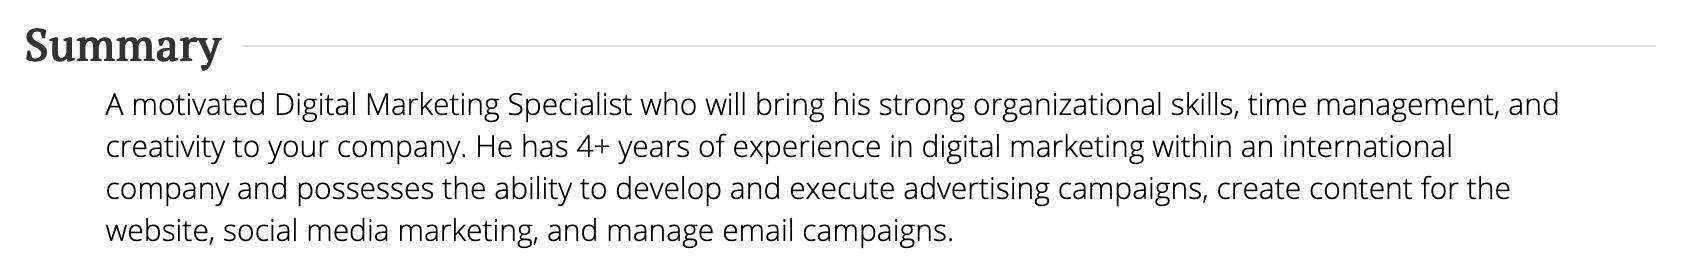 Digital Marketing Specialist Summary Statement